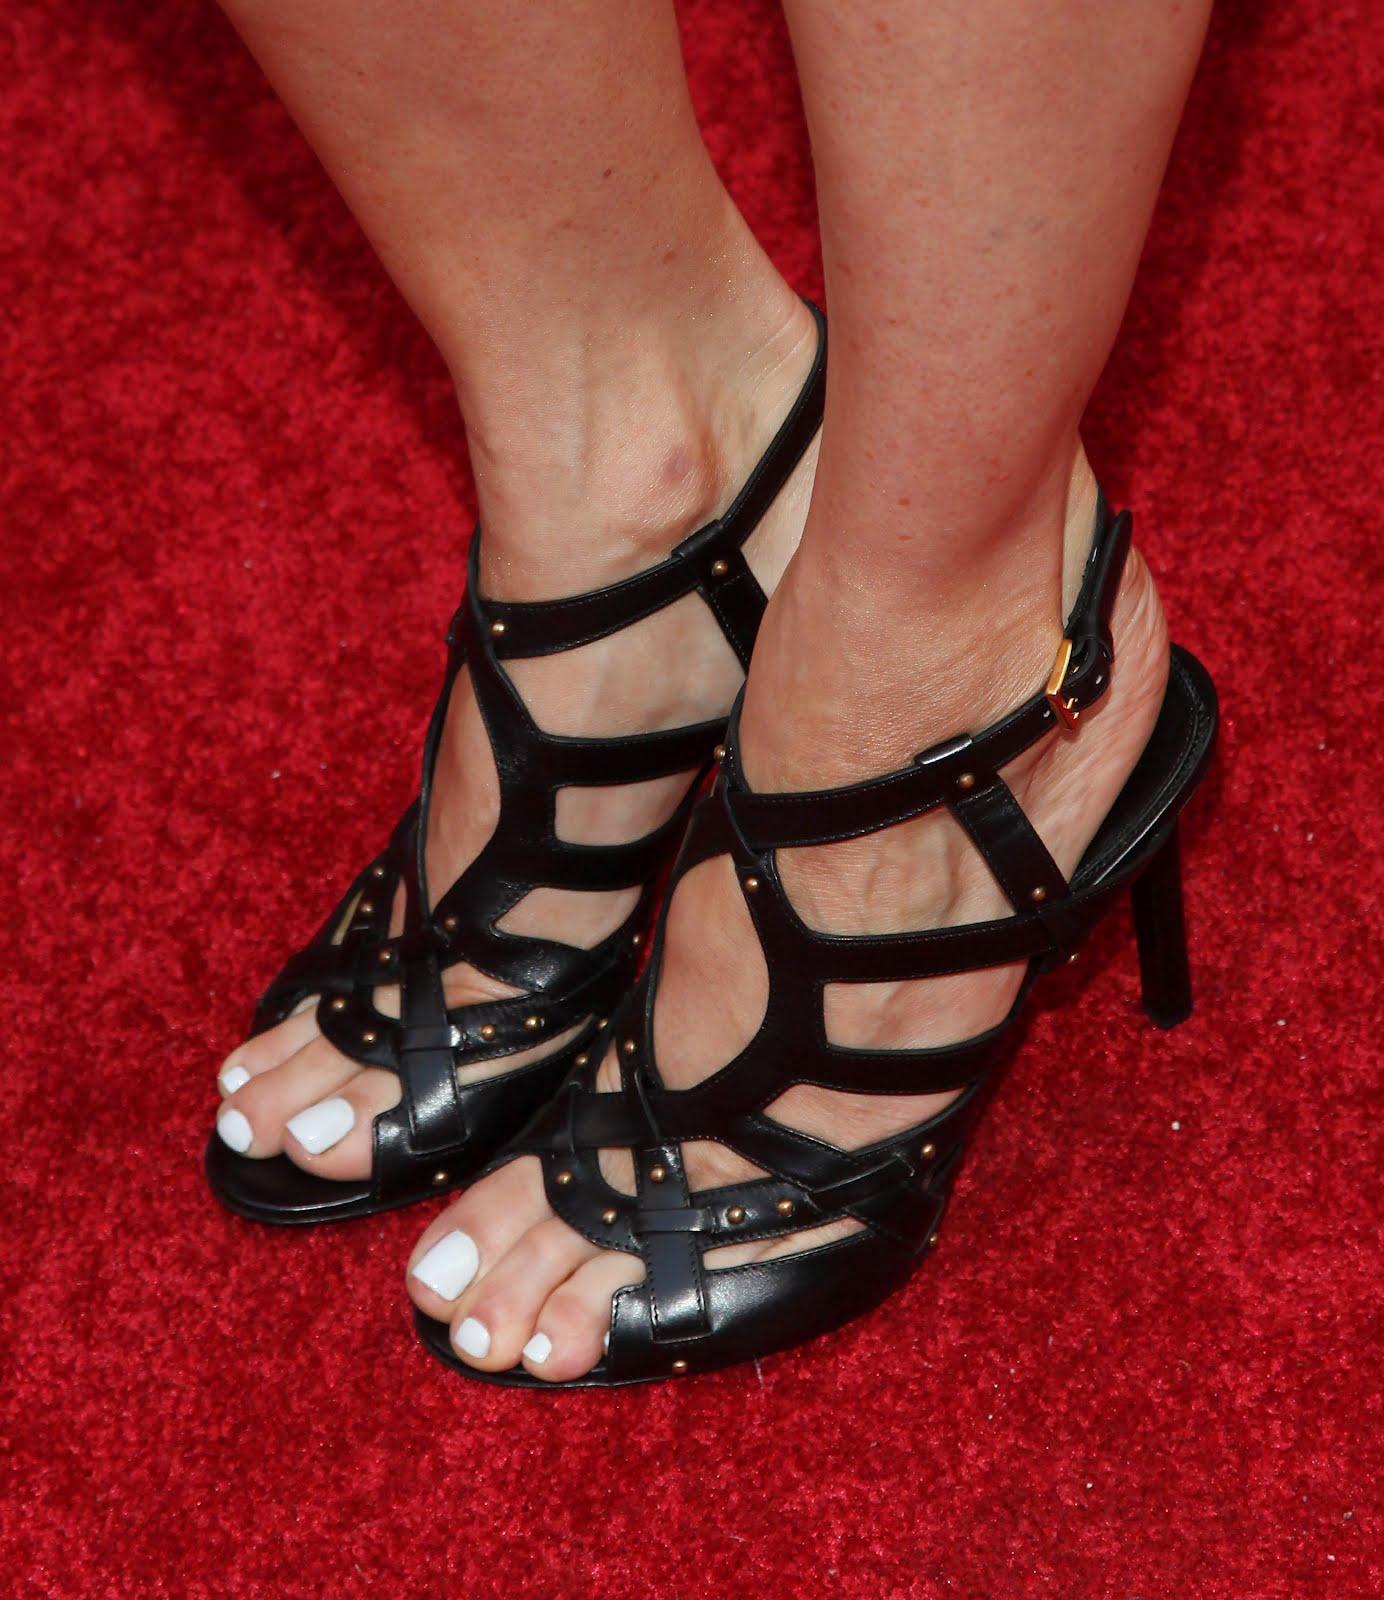 Celebrity Feet Close-up: Jenna Elfman Feet